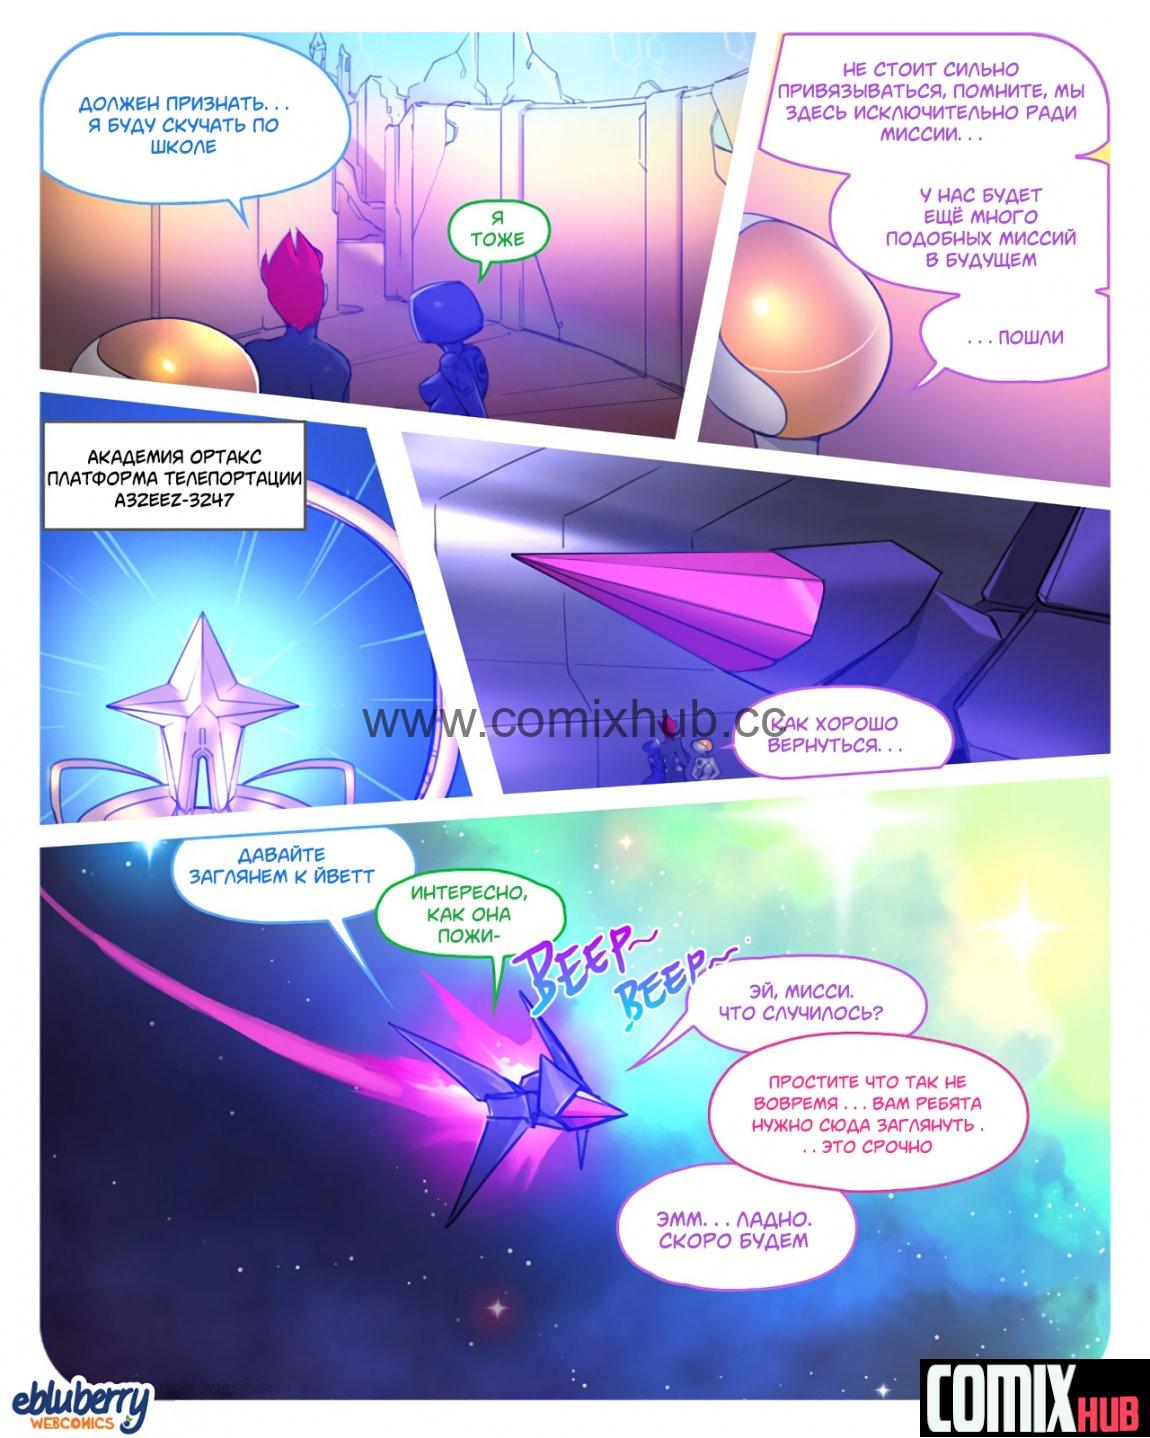 Порно комикс, Секспедиция, часть 18 Порно комиксы, Большая грудь